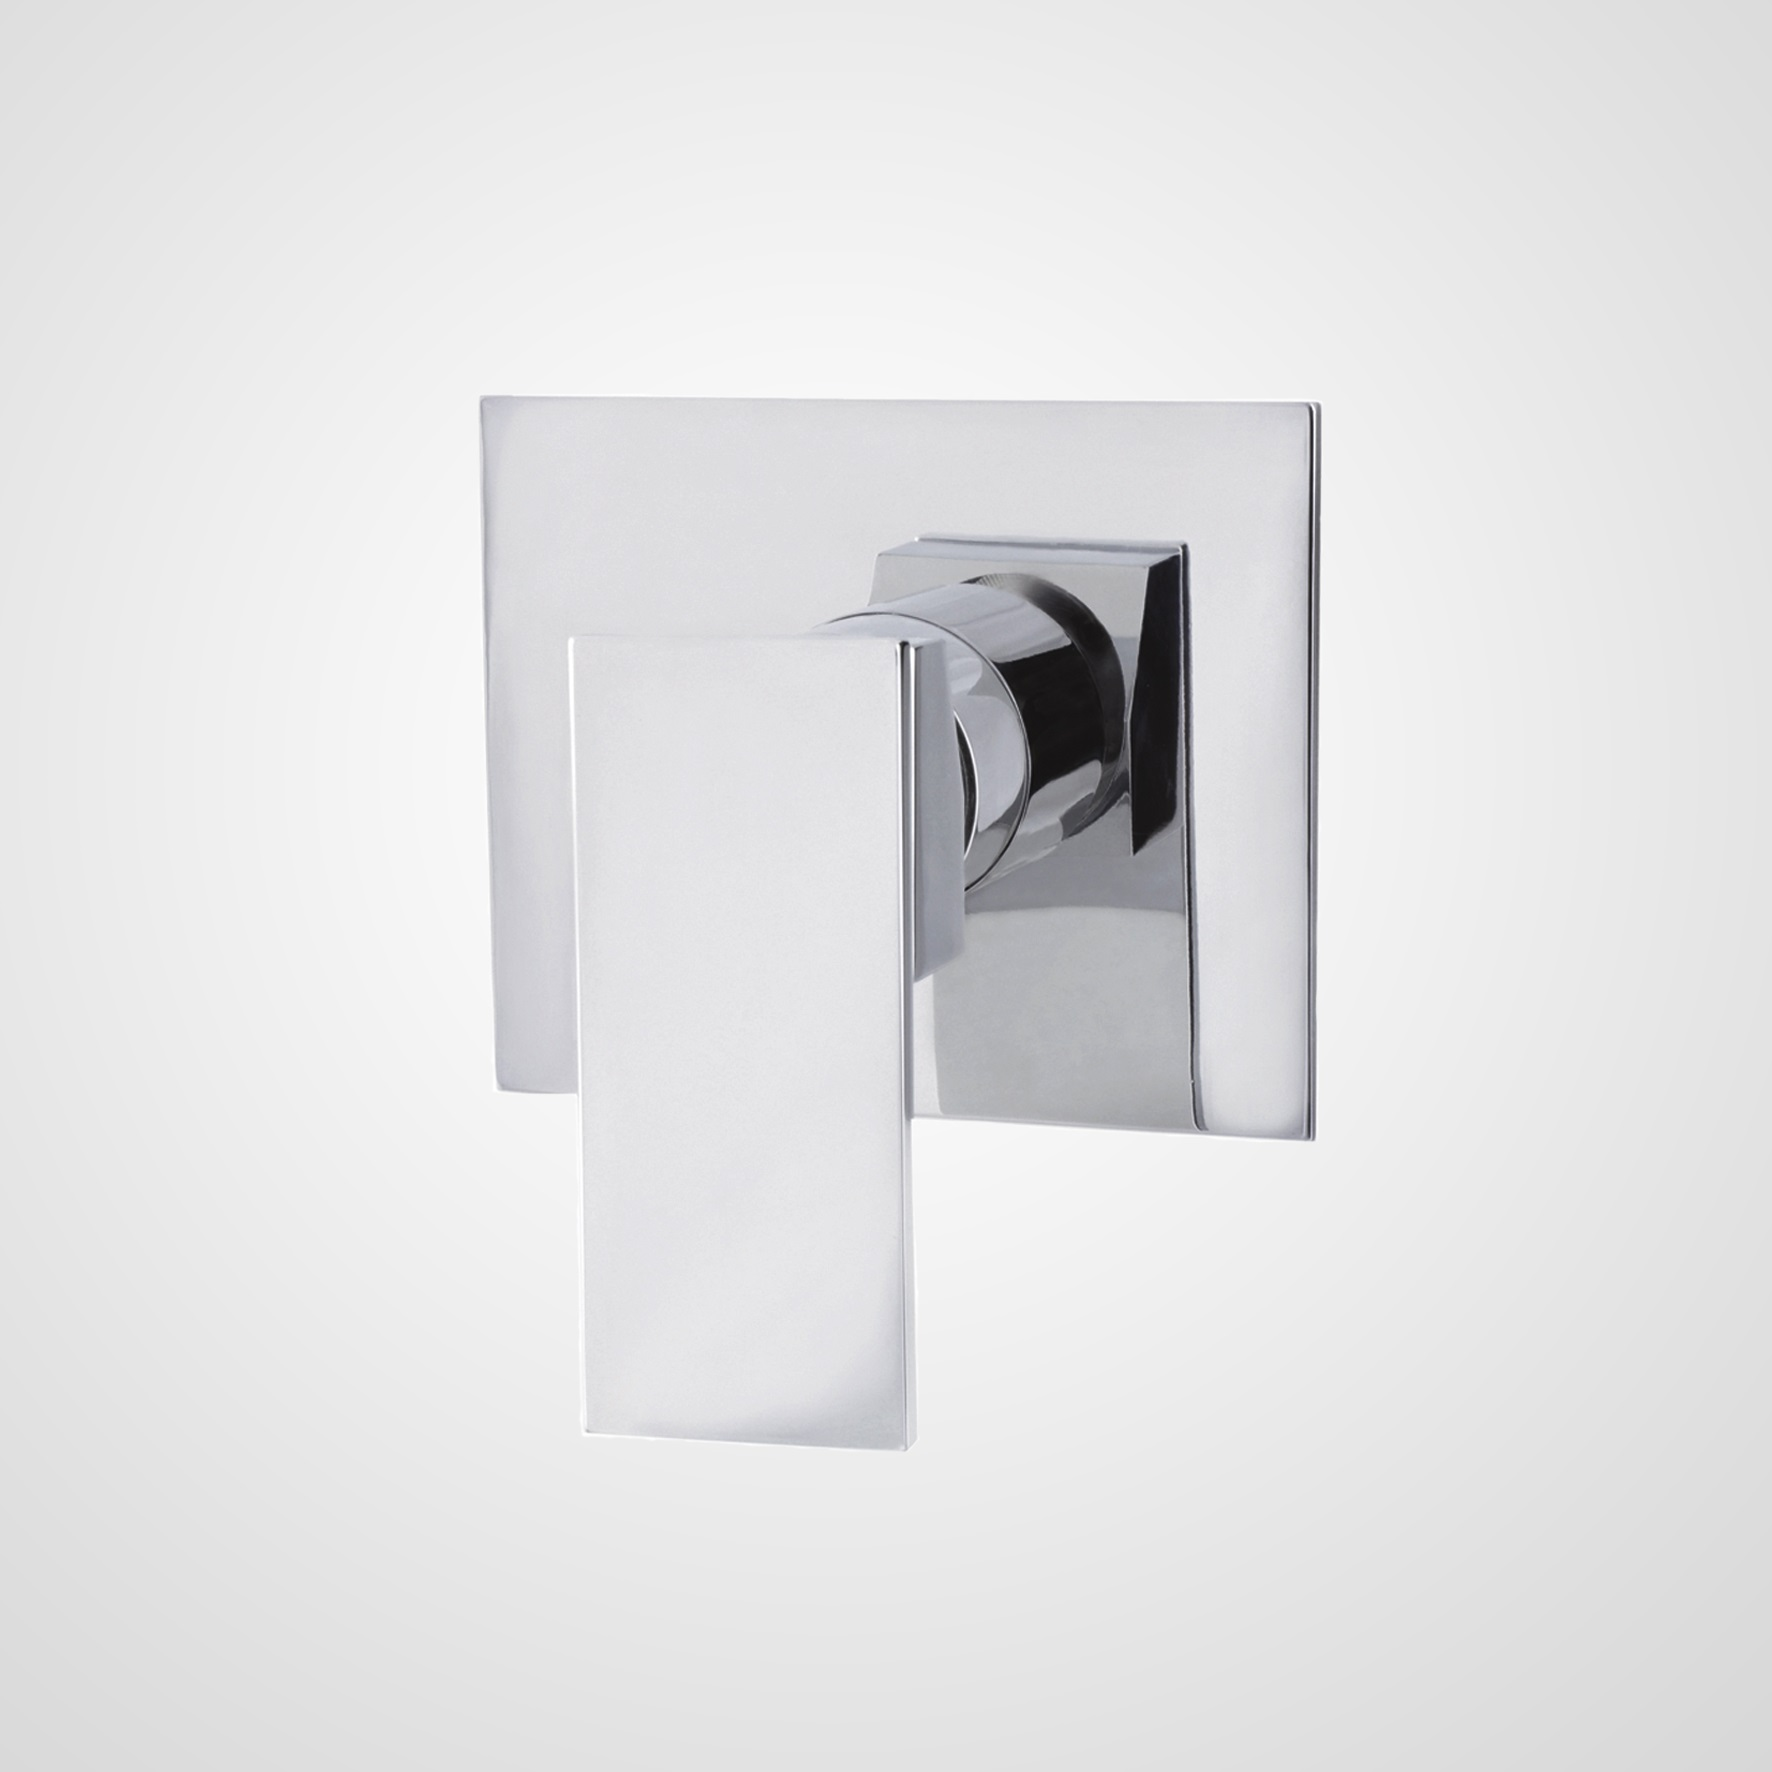 Misturador Monocomando Para Chuveiro Flaunt 4900 C91 - INATIVO